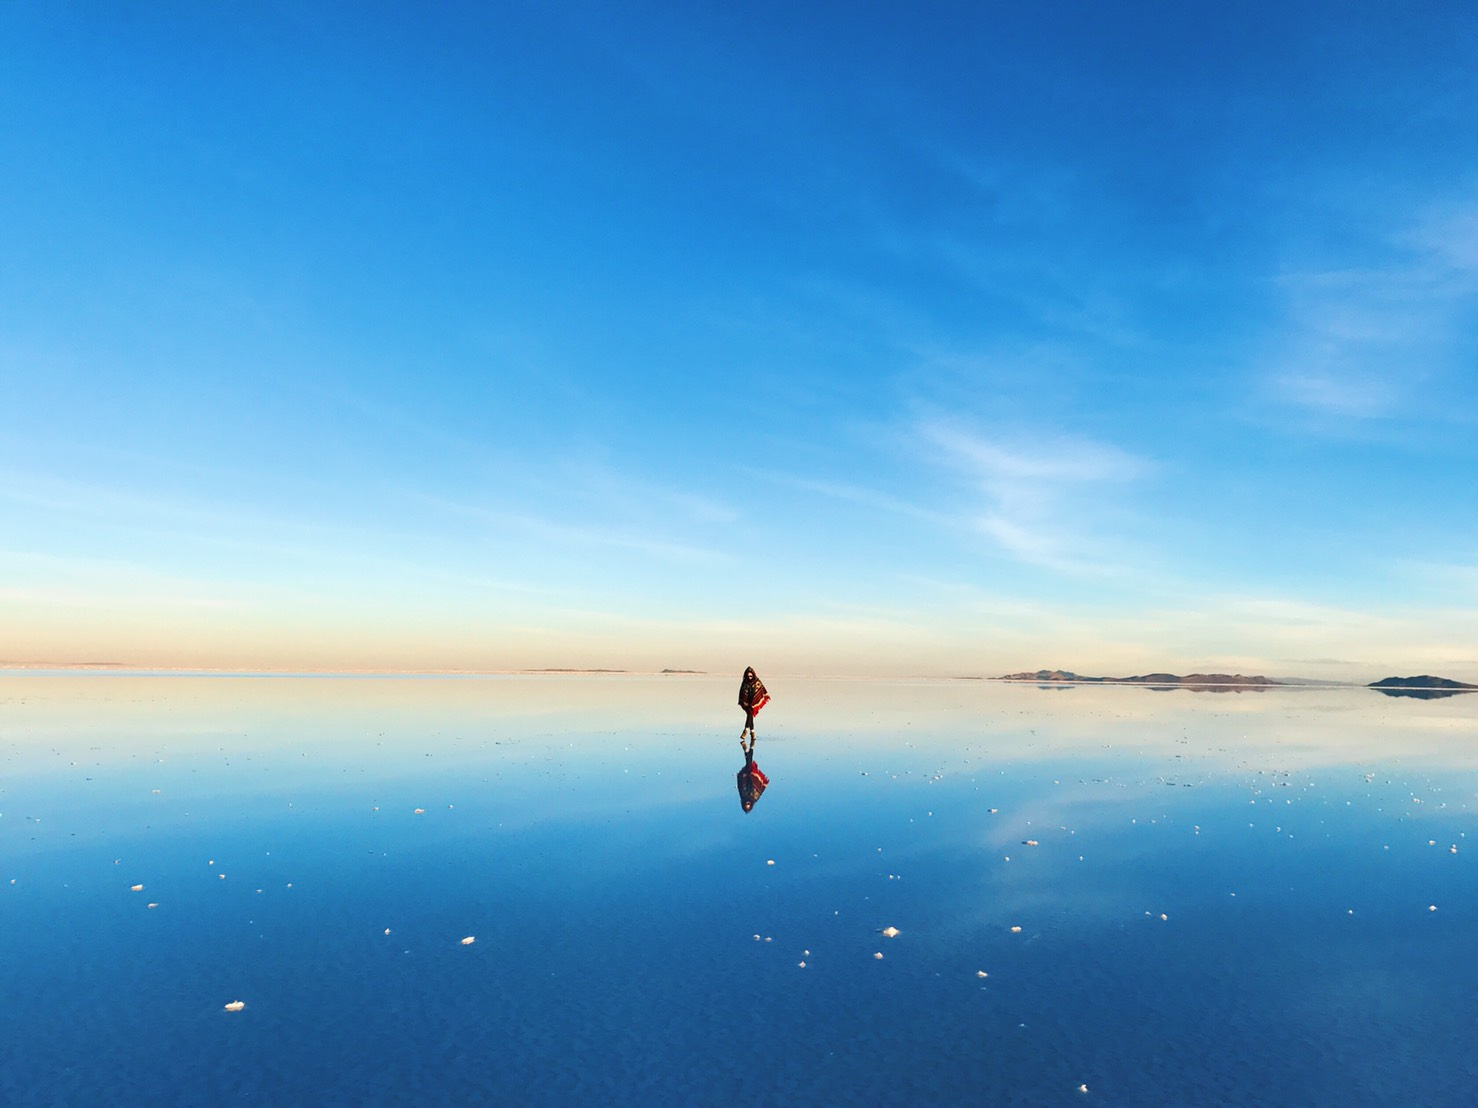 Salar de Uyuni นี่มันโลกไหนเนี่ยยยยย - Pantip